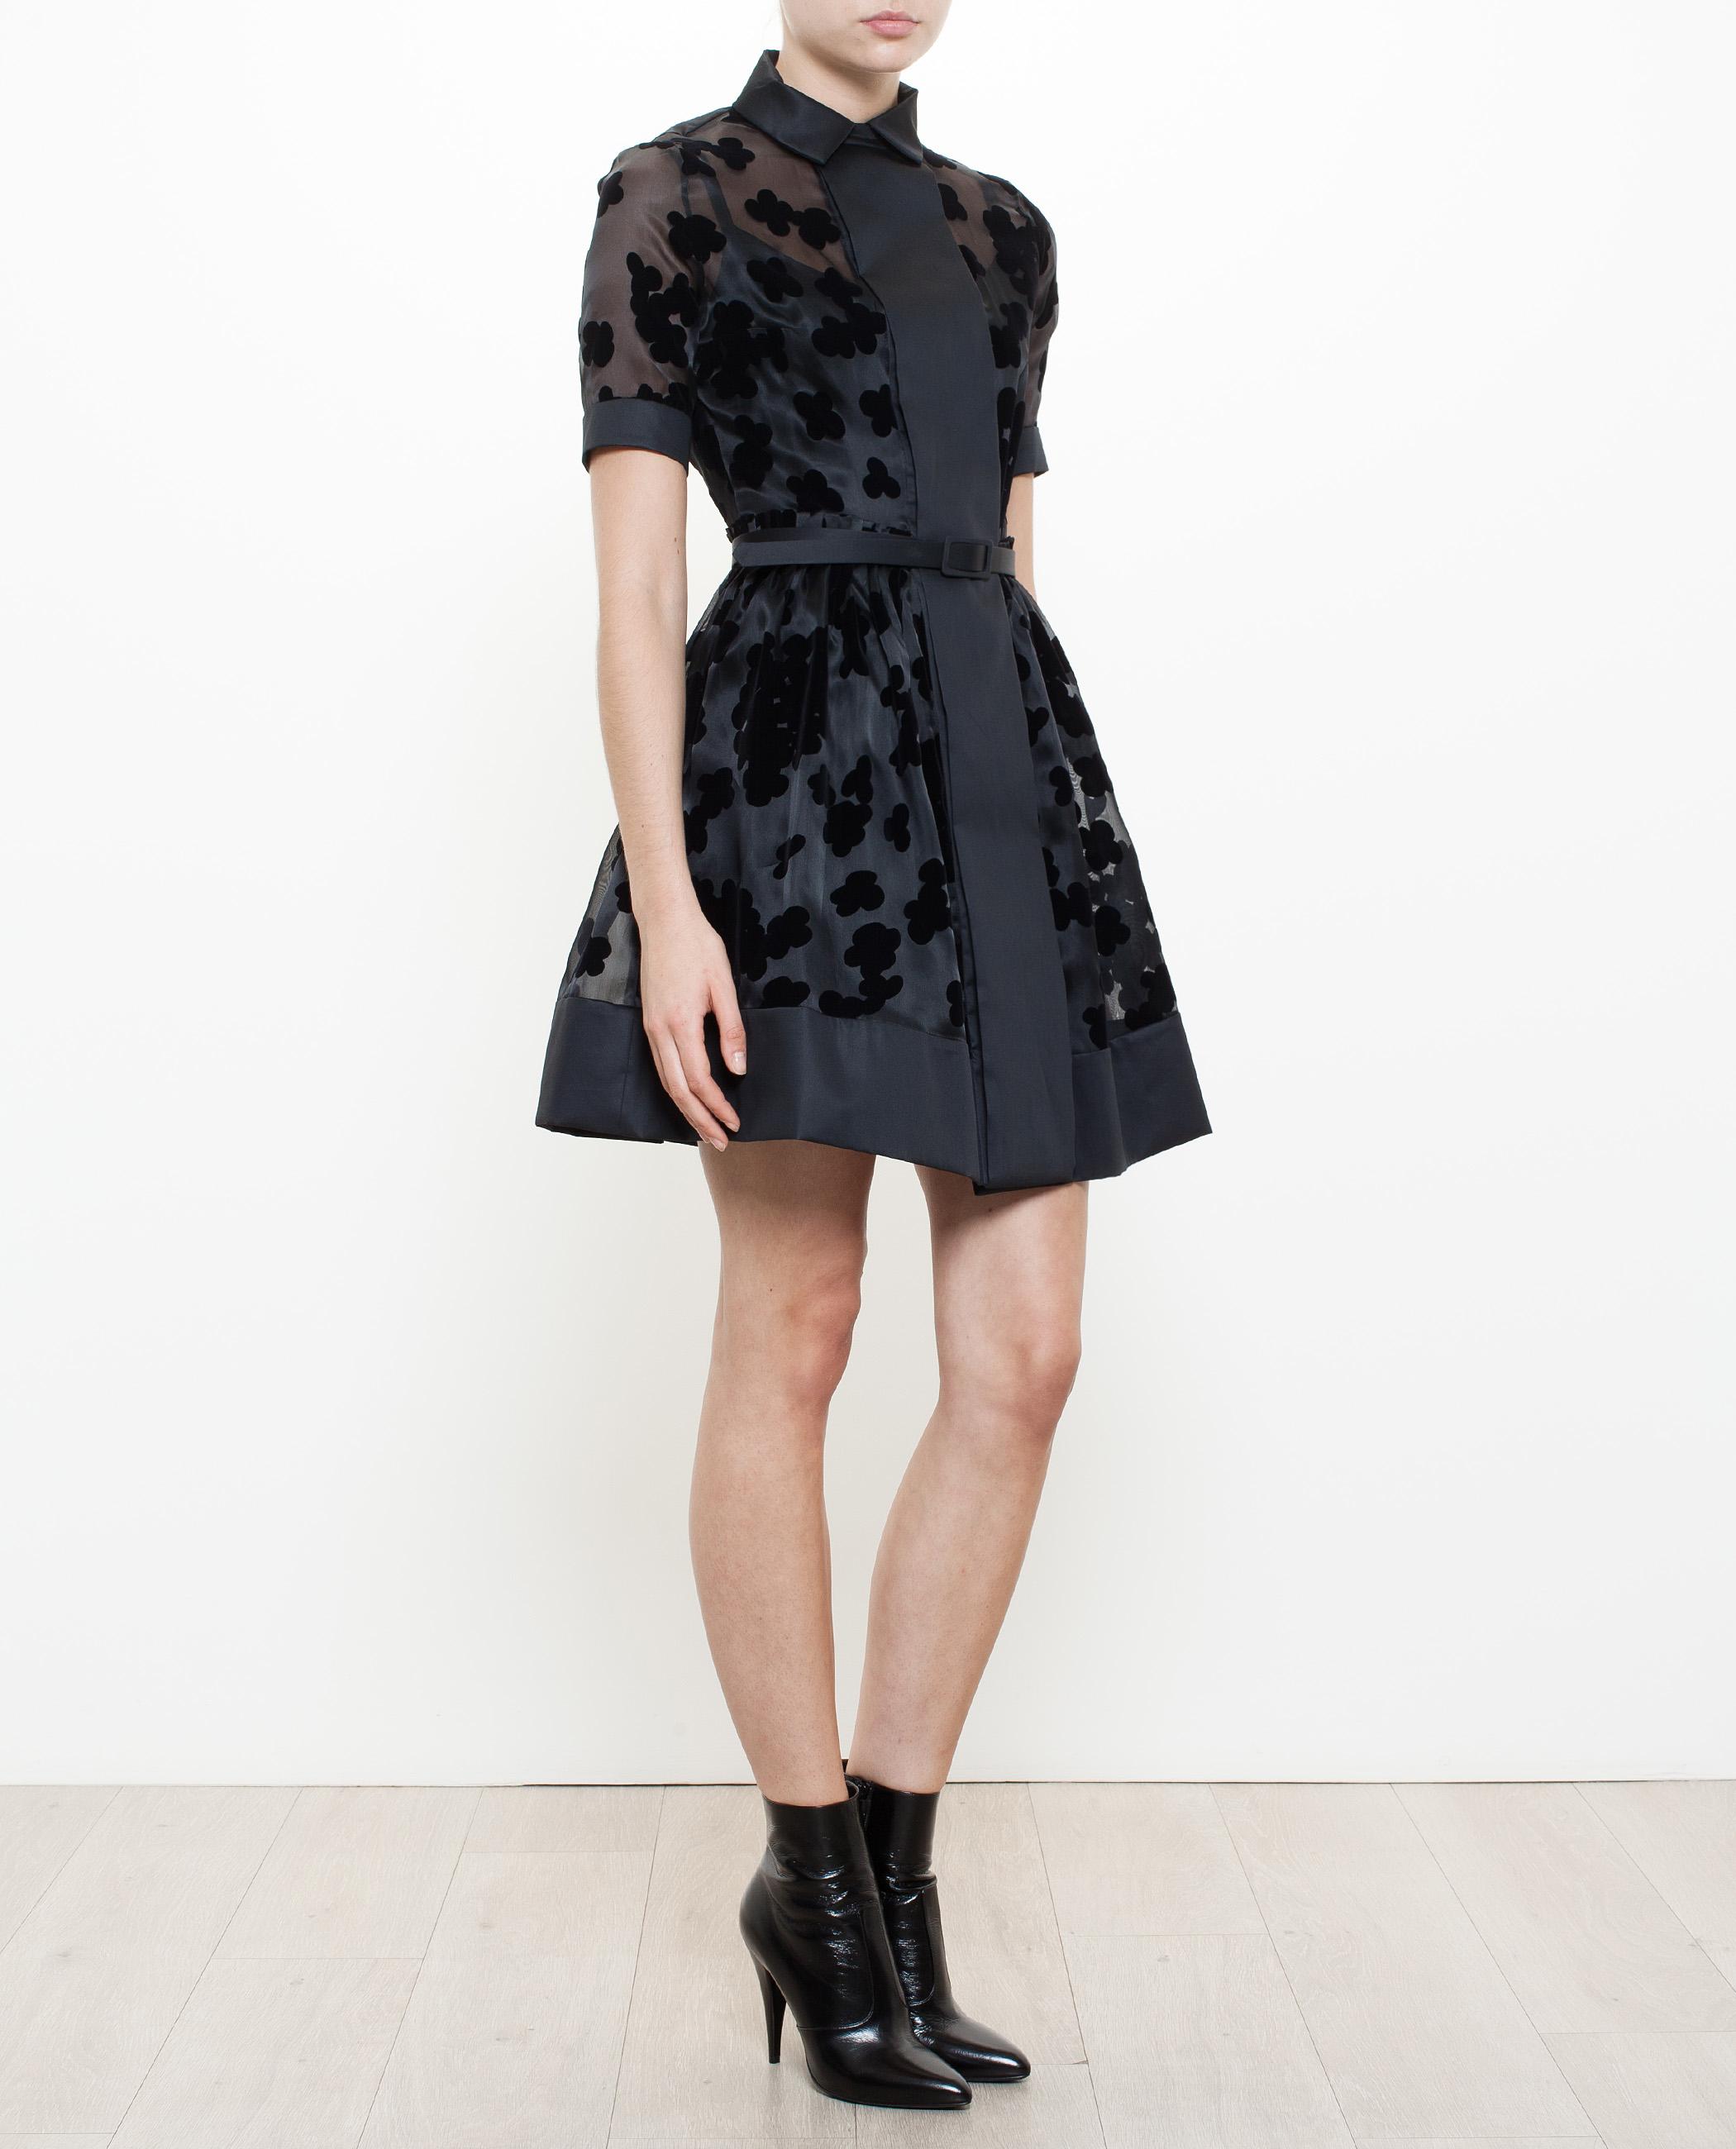 Lyst - Carven Floral Organza Dress in Black